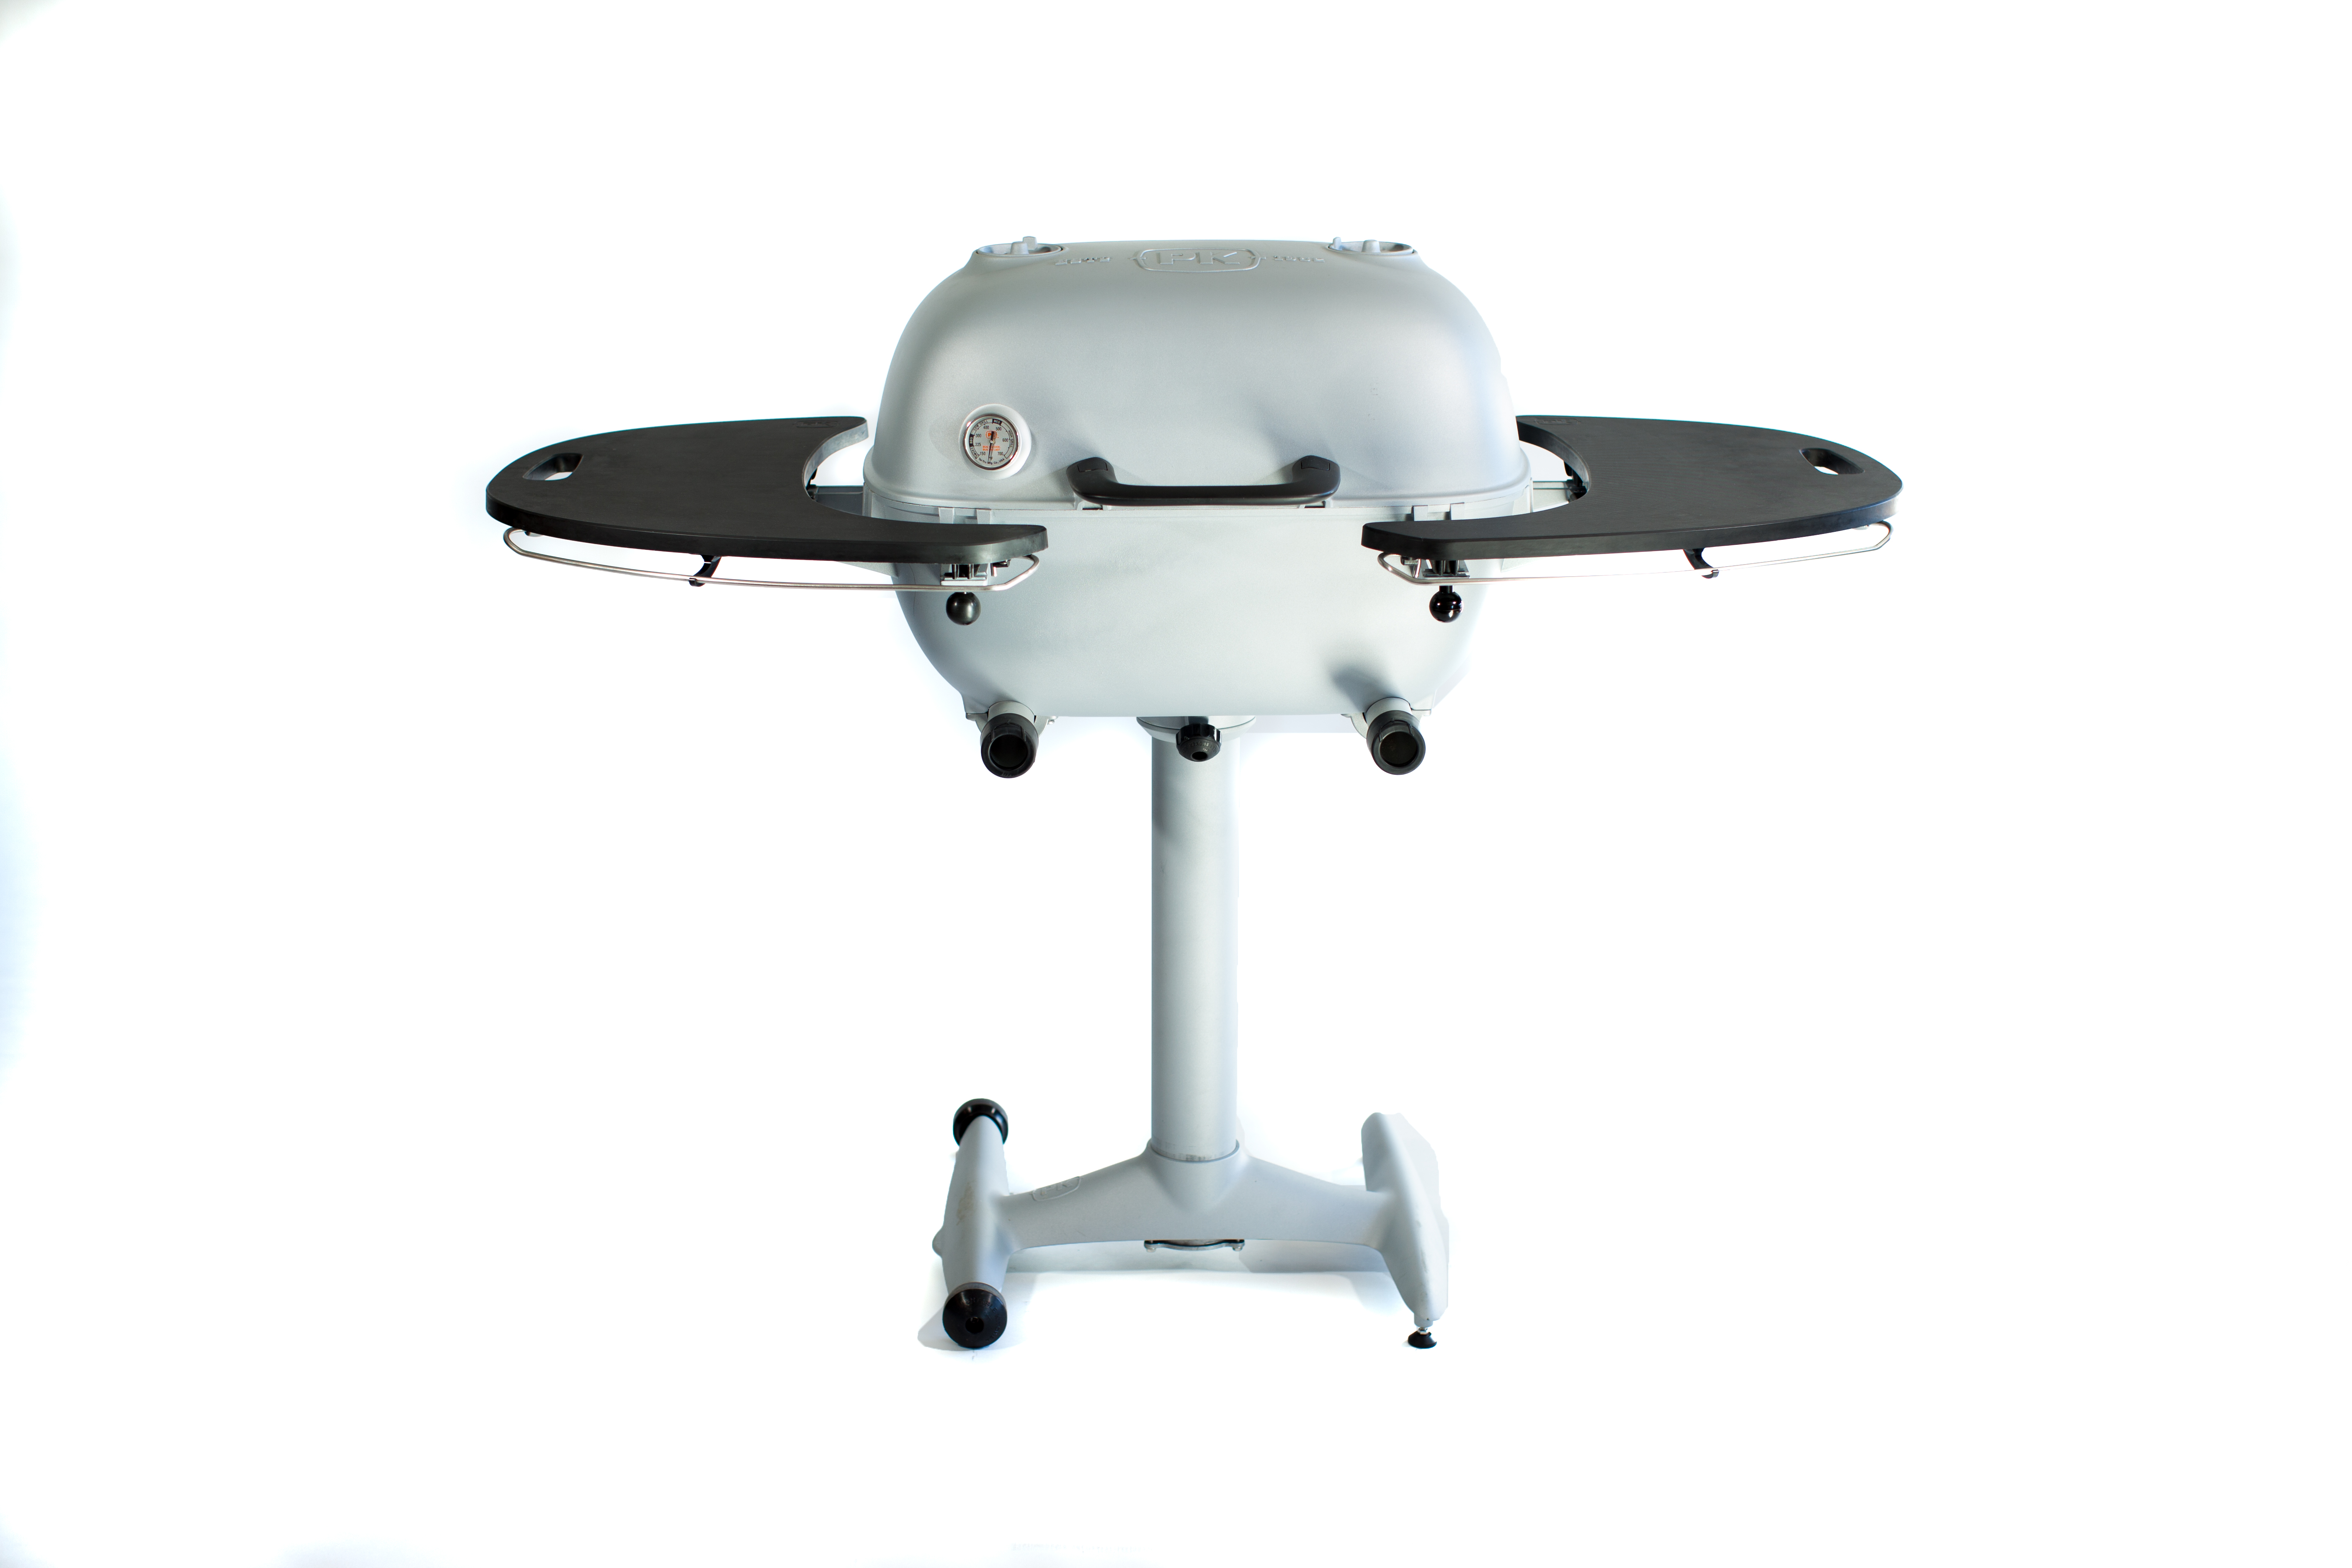 Kolgrill & Smoker PK360 - Portable Kitchen